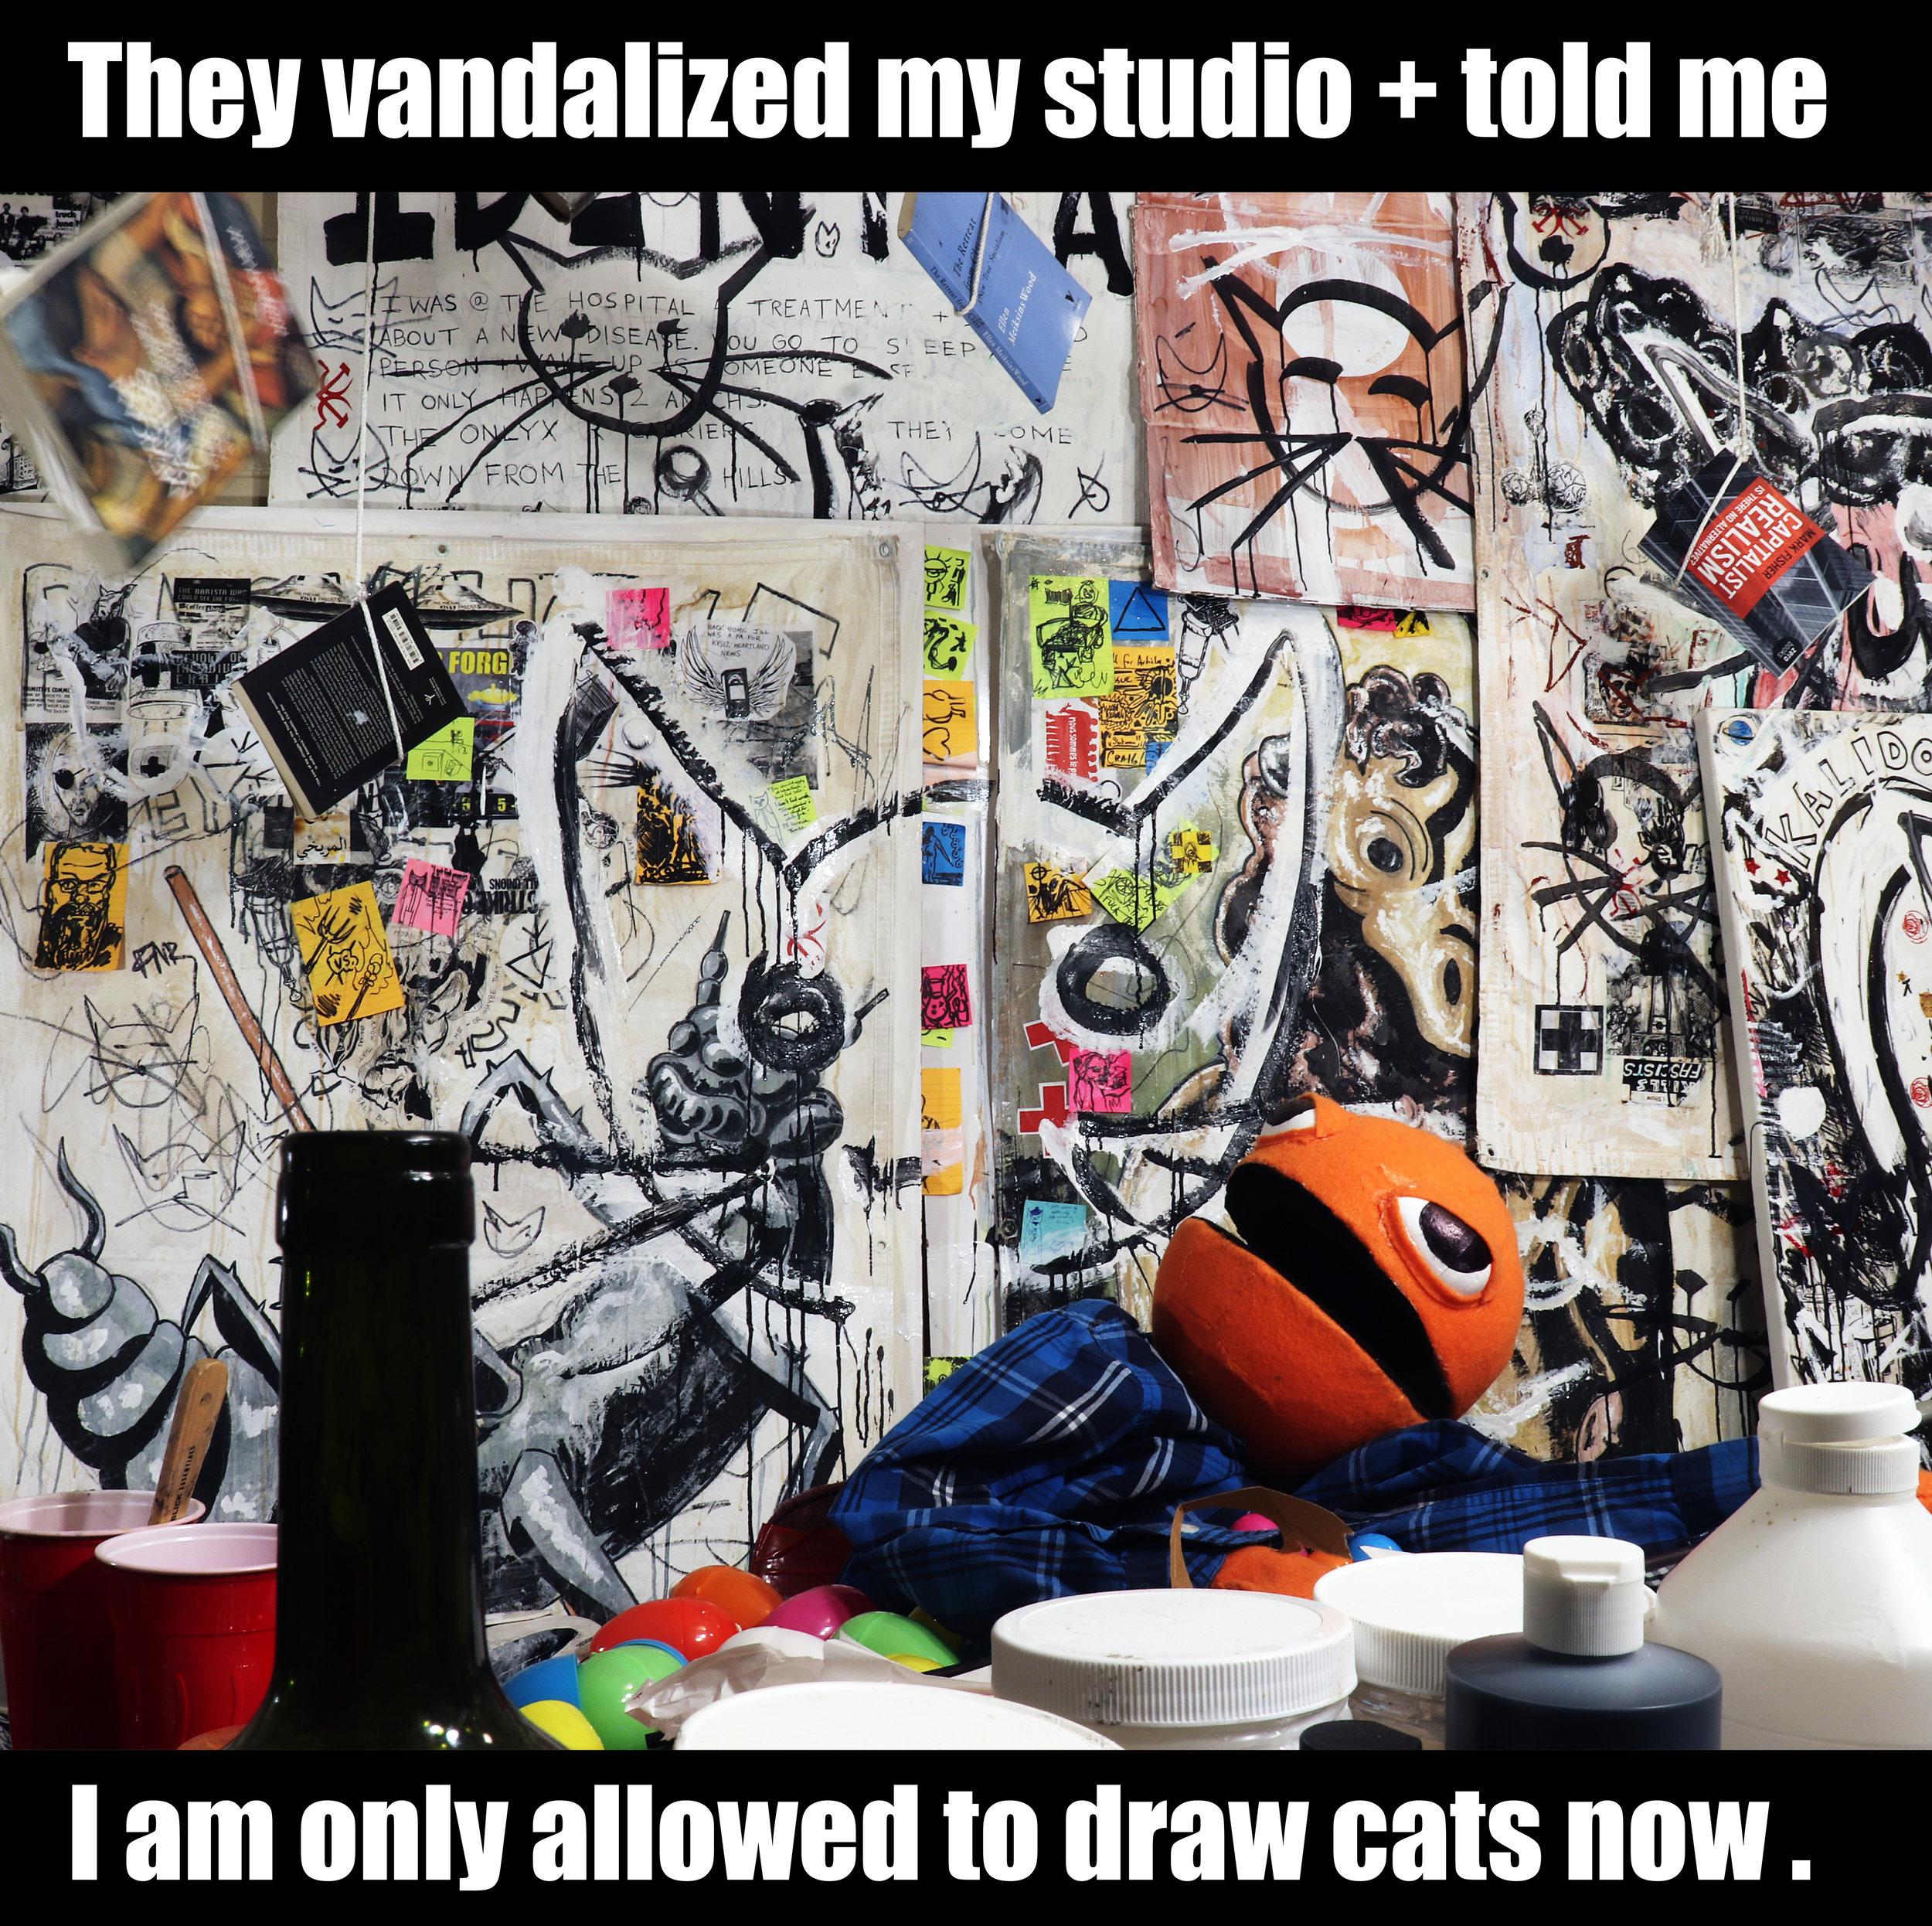 https://www.anachs.com/blog-1/onlycats